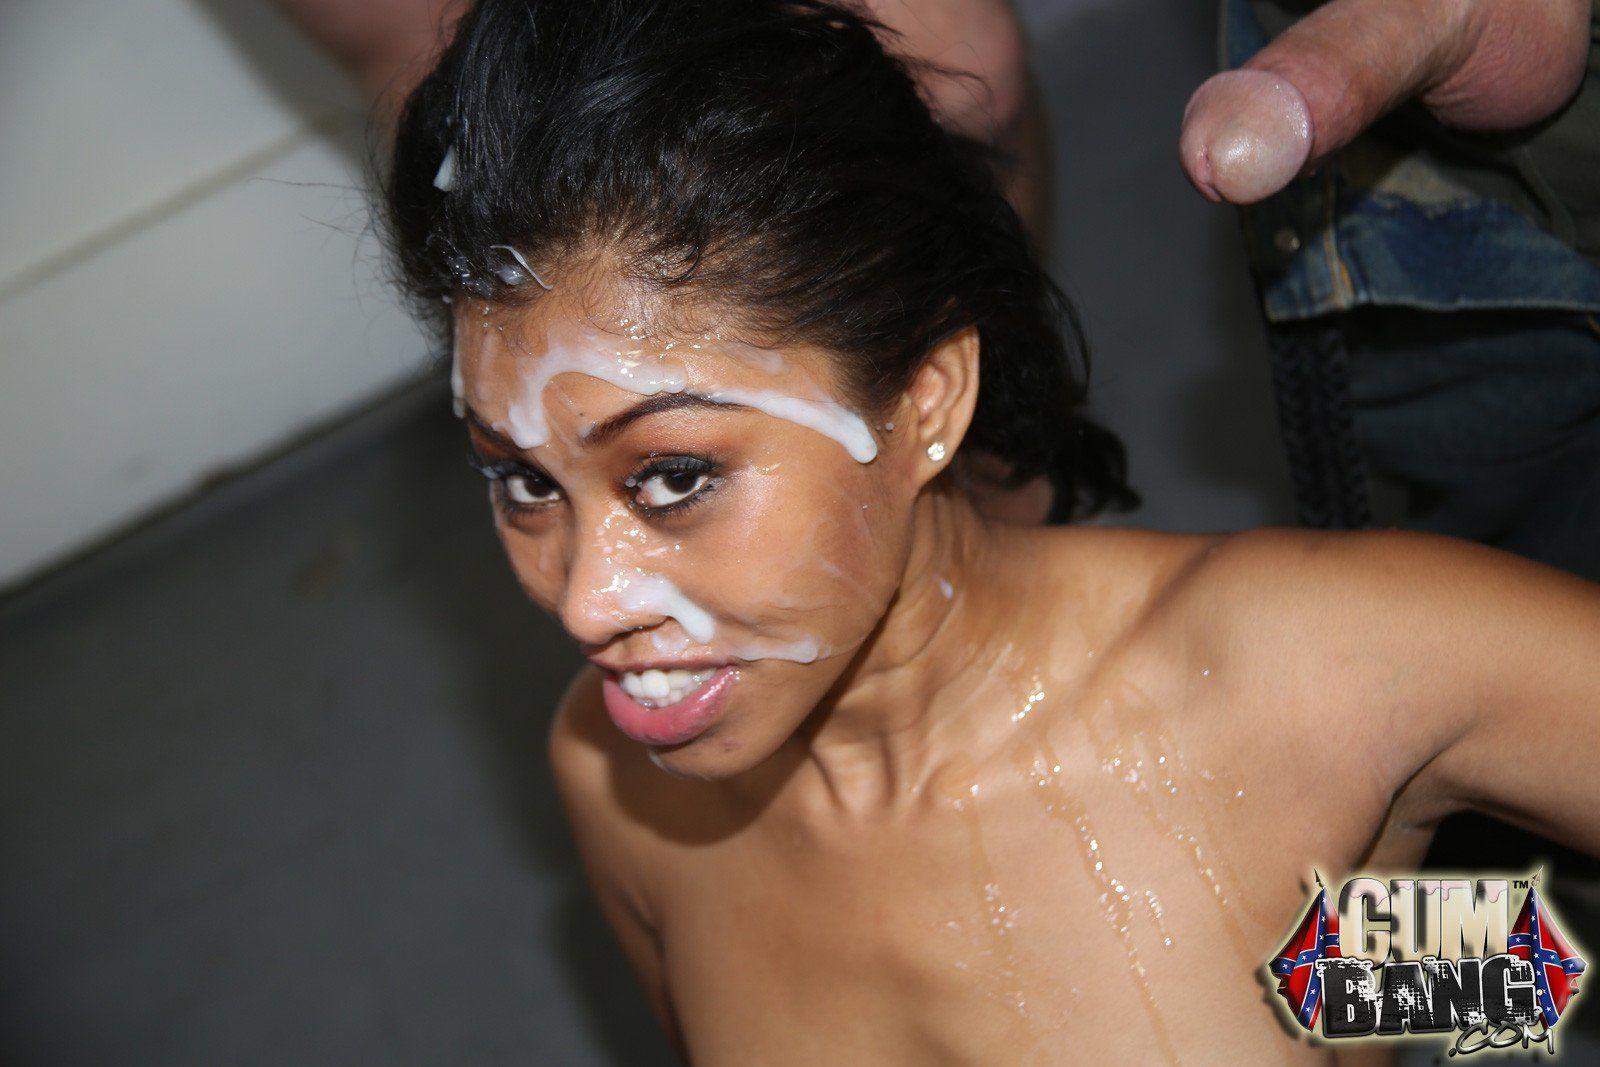 Amateur Bukkake Porn black bukkake . xxx sex images.